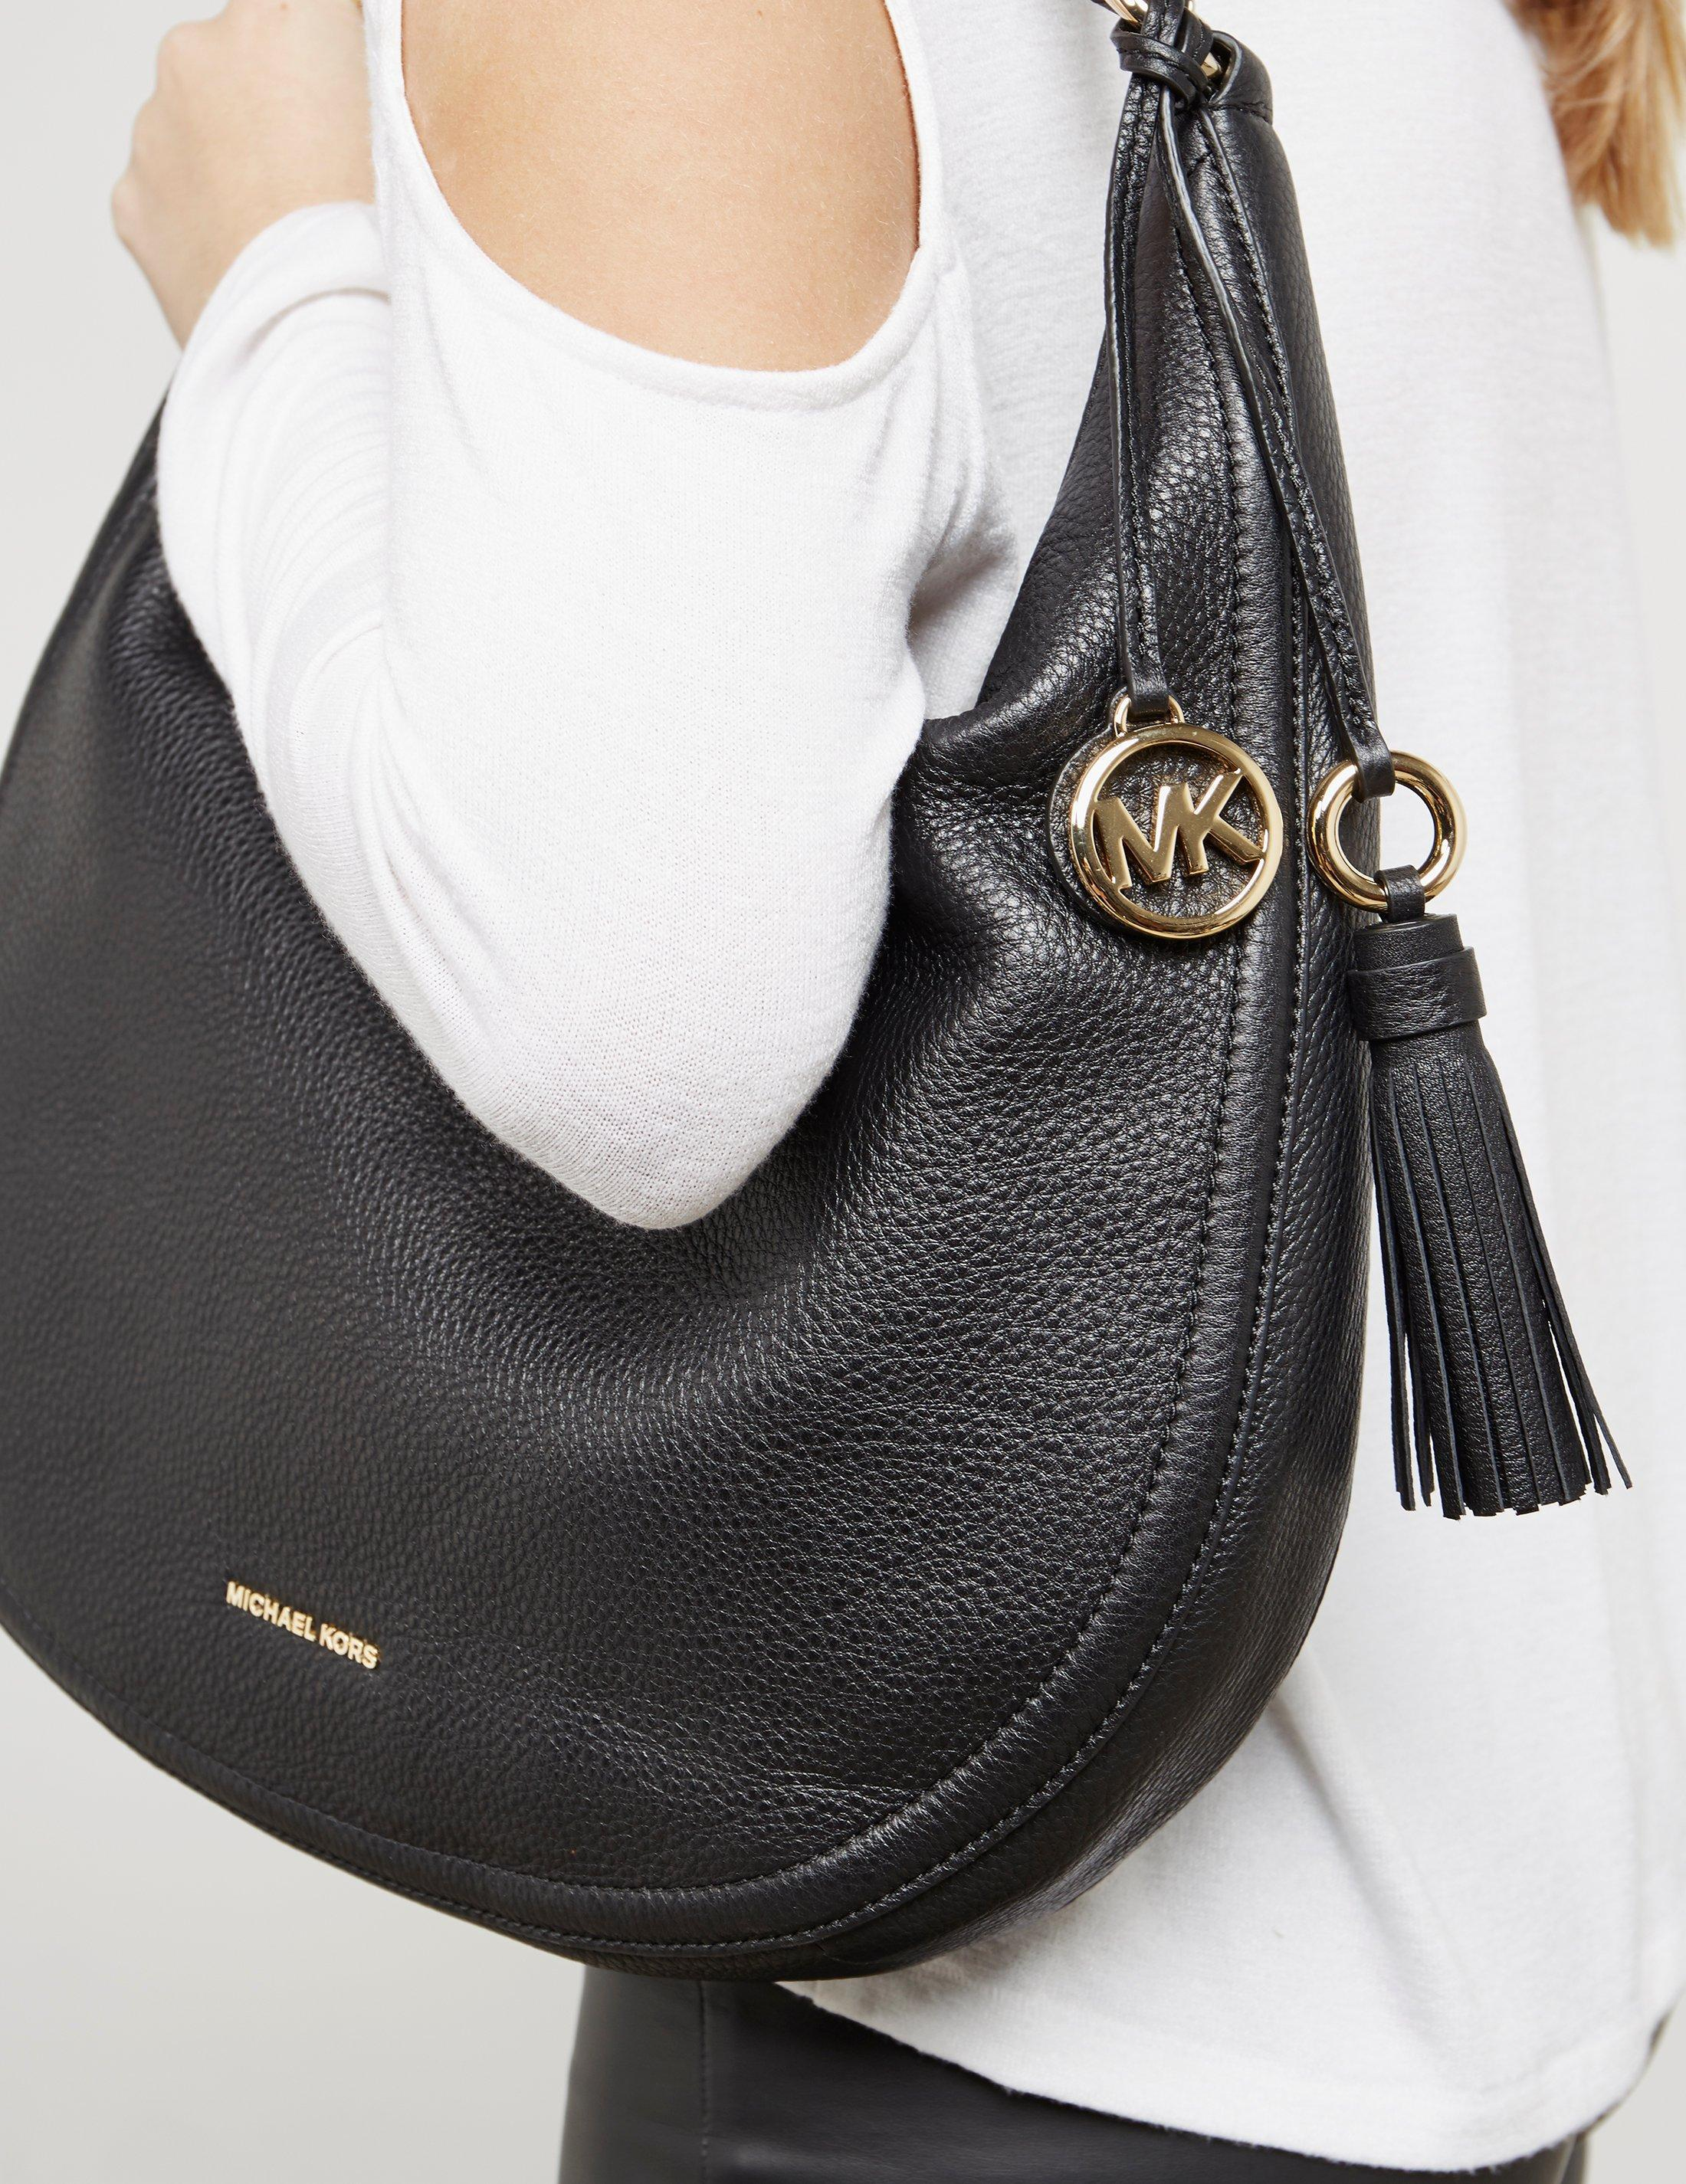 a6641c66daf0 Michael Kors Womens Lydia Hobo Shopper Bag Black in Black - Lyst